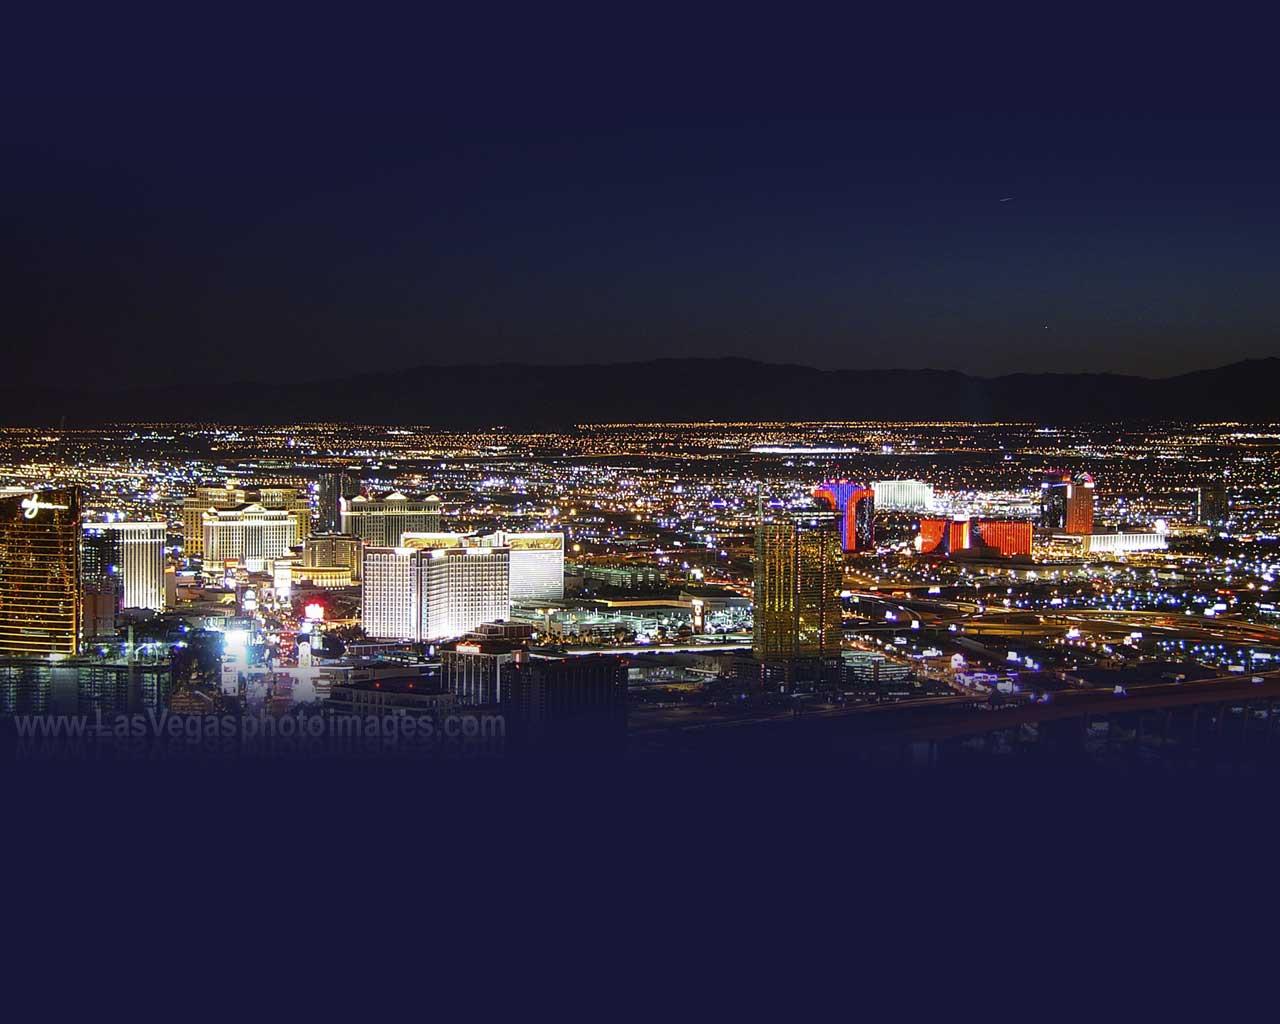 Free Las Vegas Wallpapers And Screensavers